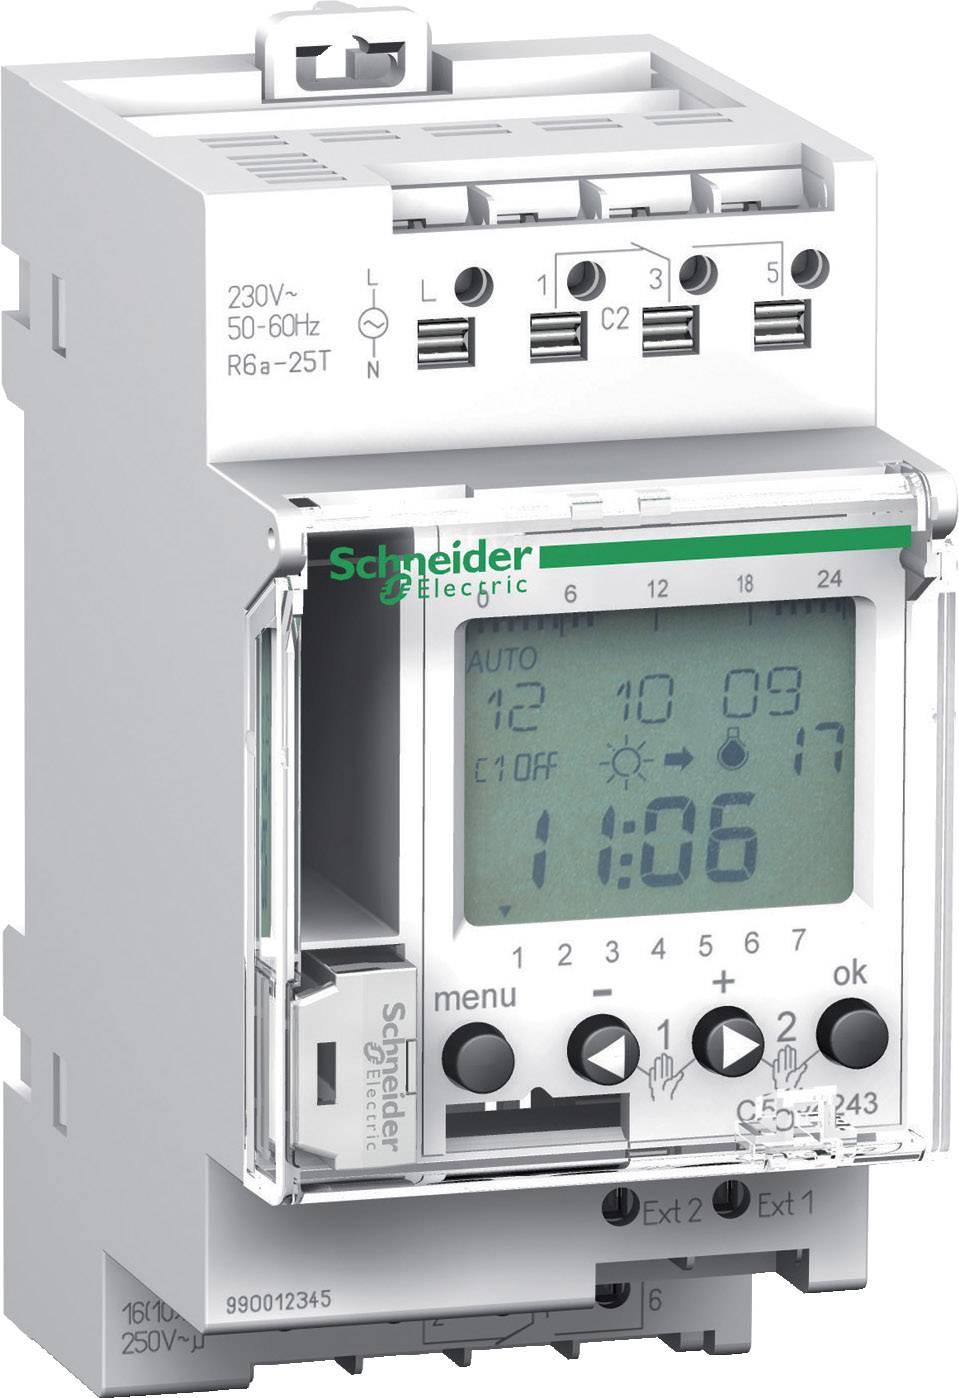 Řezačka CCT15244 Ic Astro 2kanálový Schneider Electric CCT15244